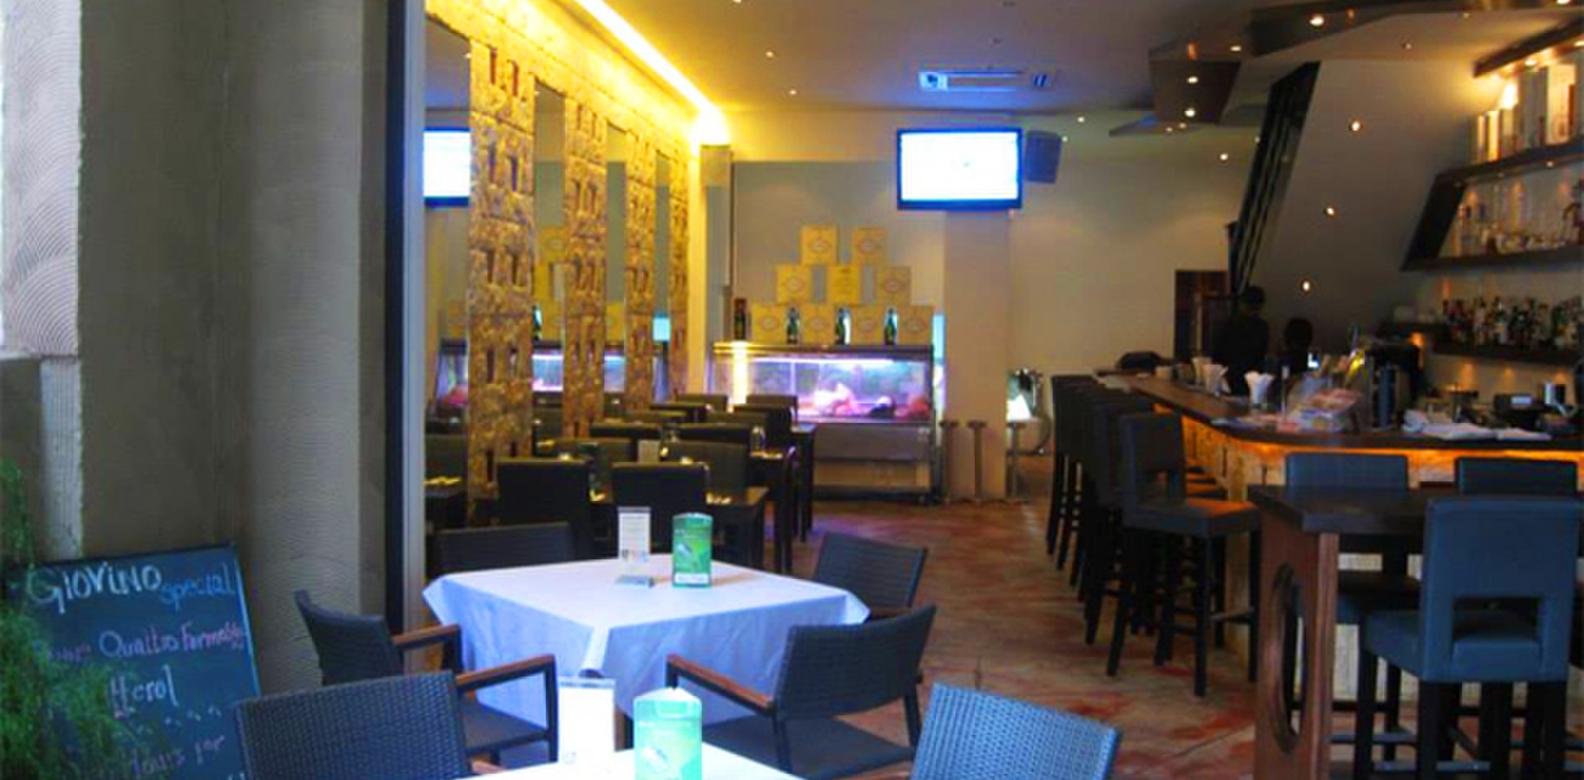 5 Mediterranean Restaurants For Your Next Night Out